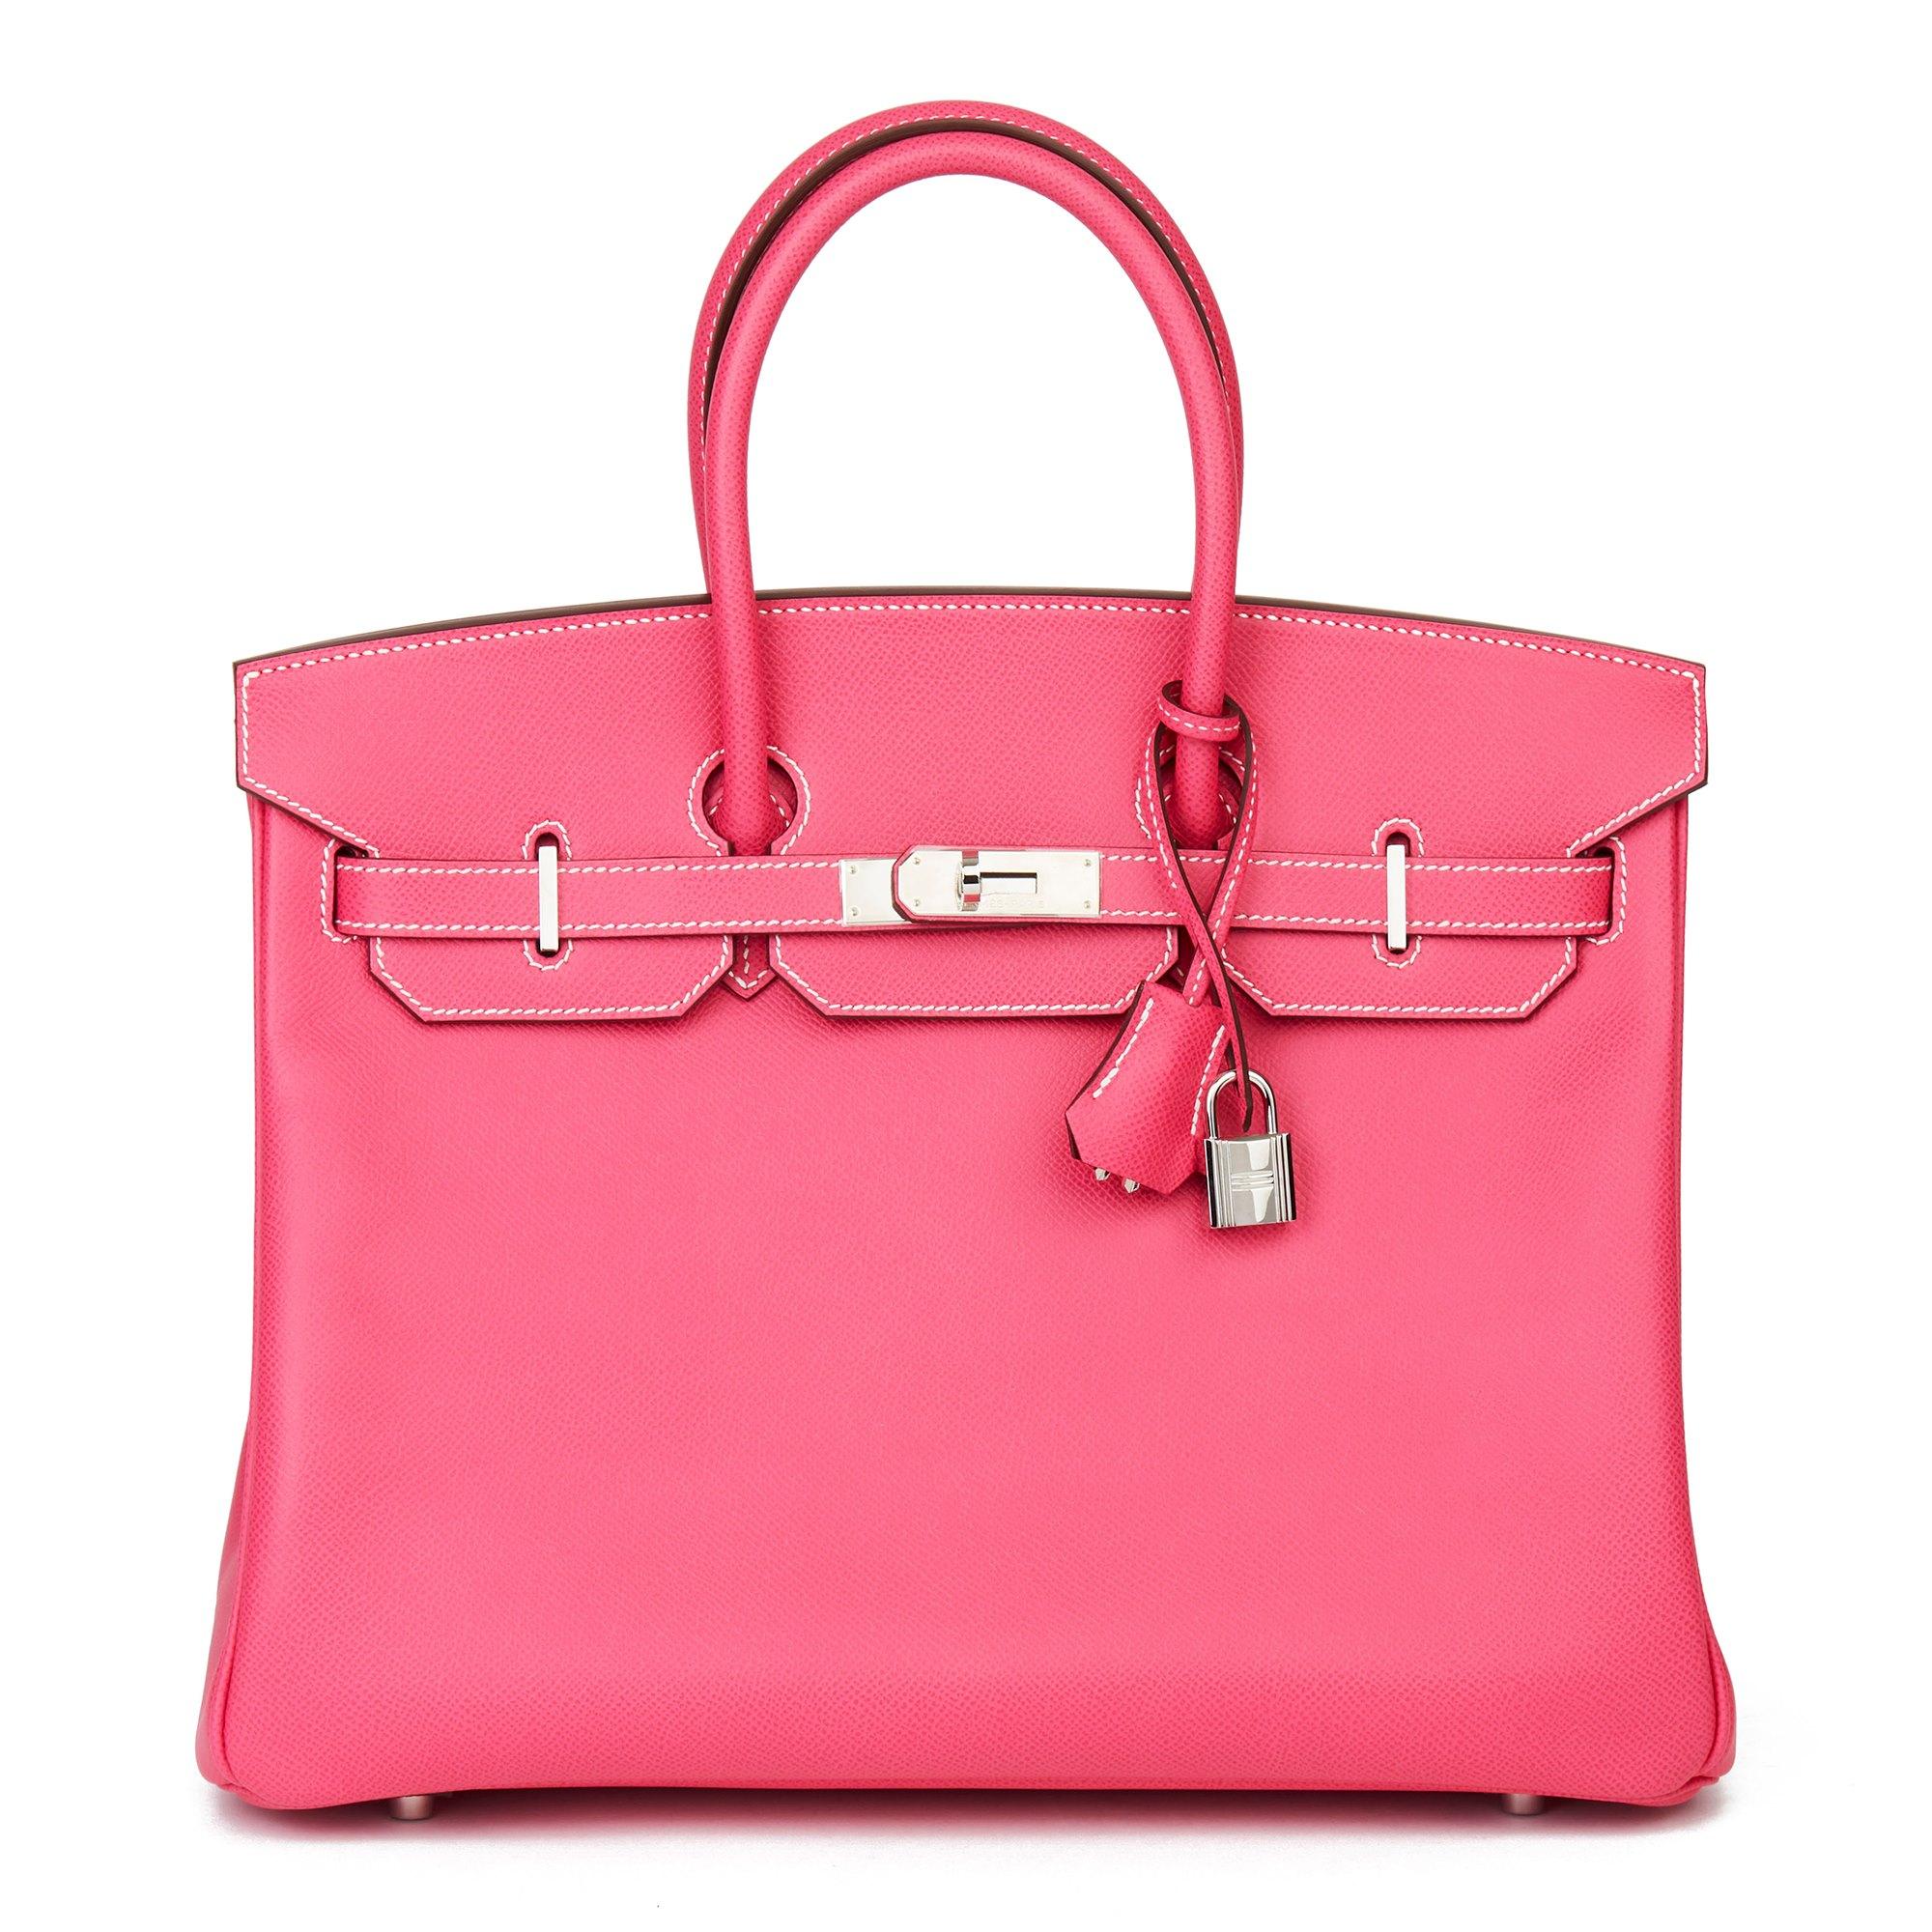 Hermès Rose Tyrien & Rubis Epsom Leather Candy Collection Birkin 35cm